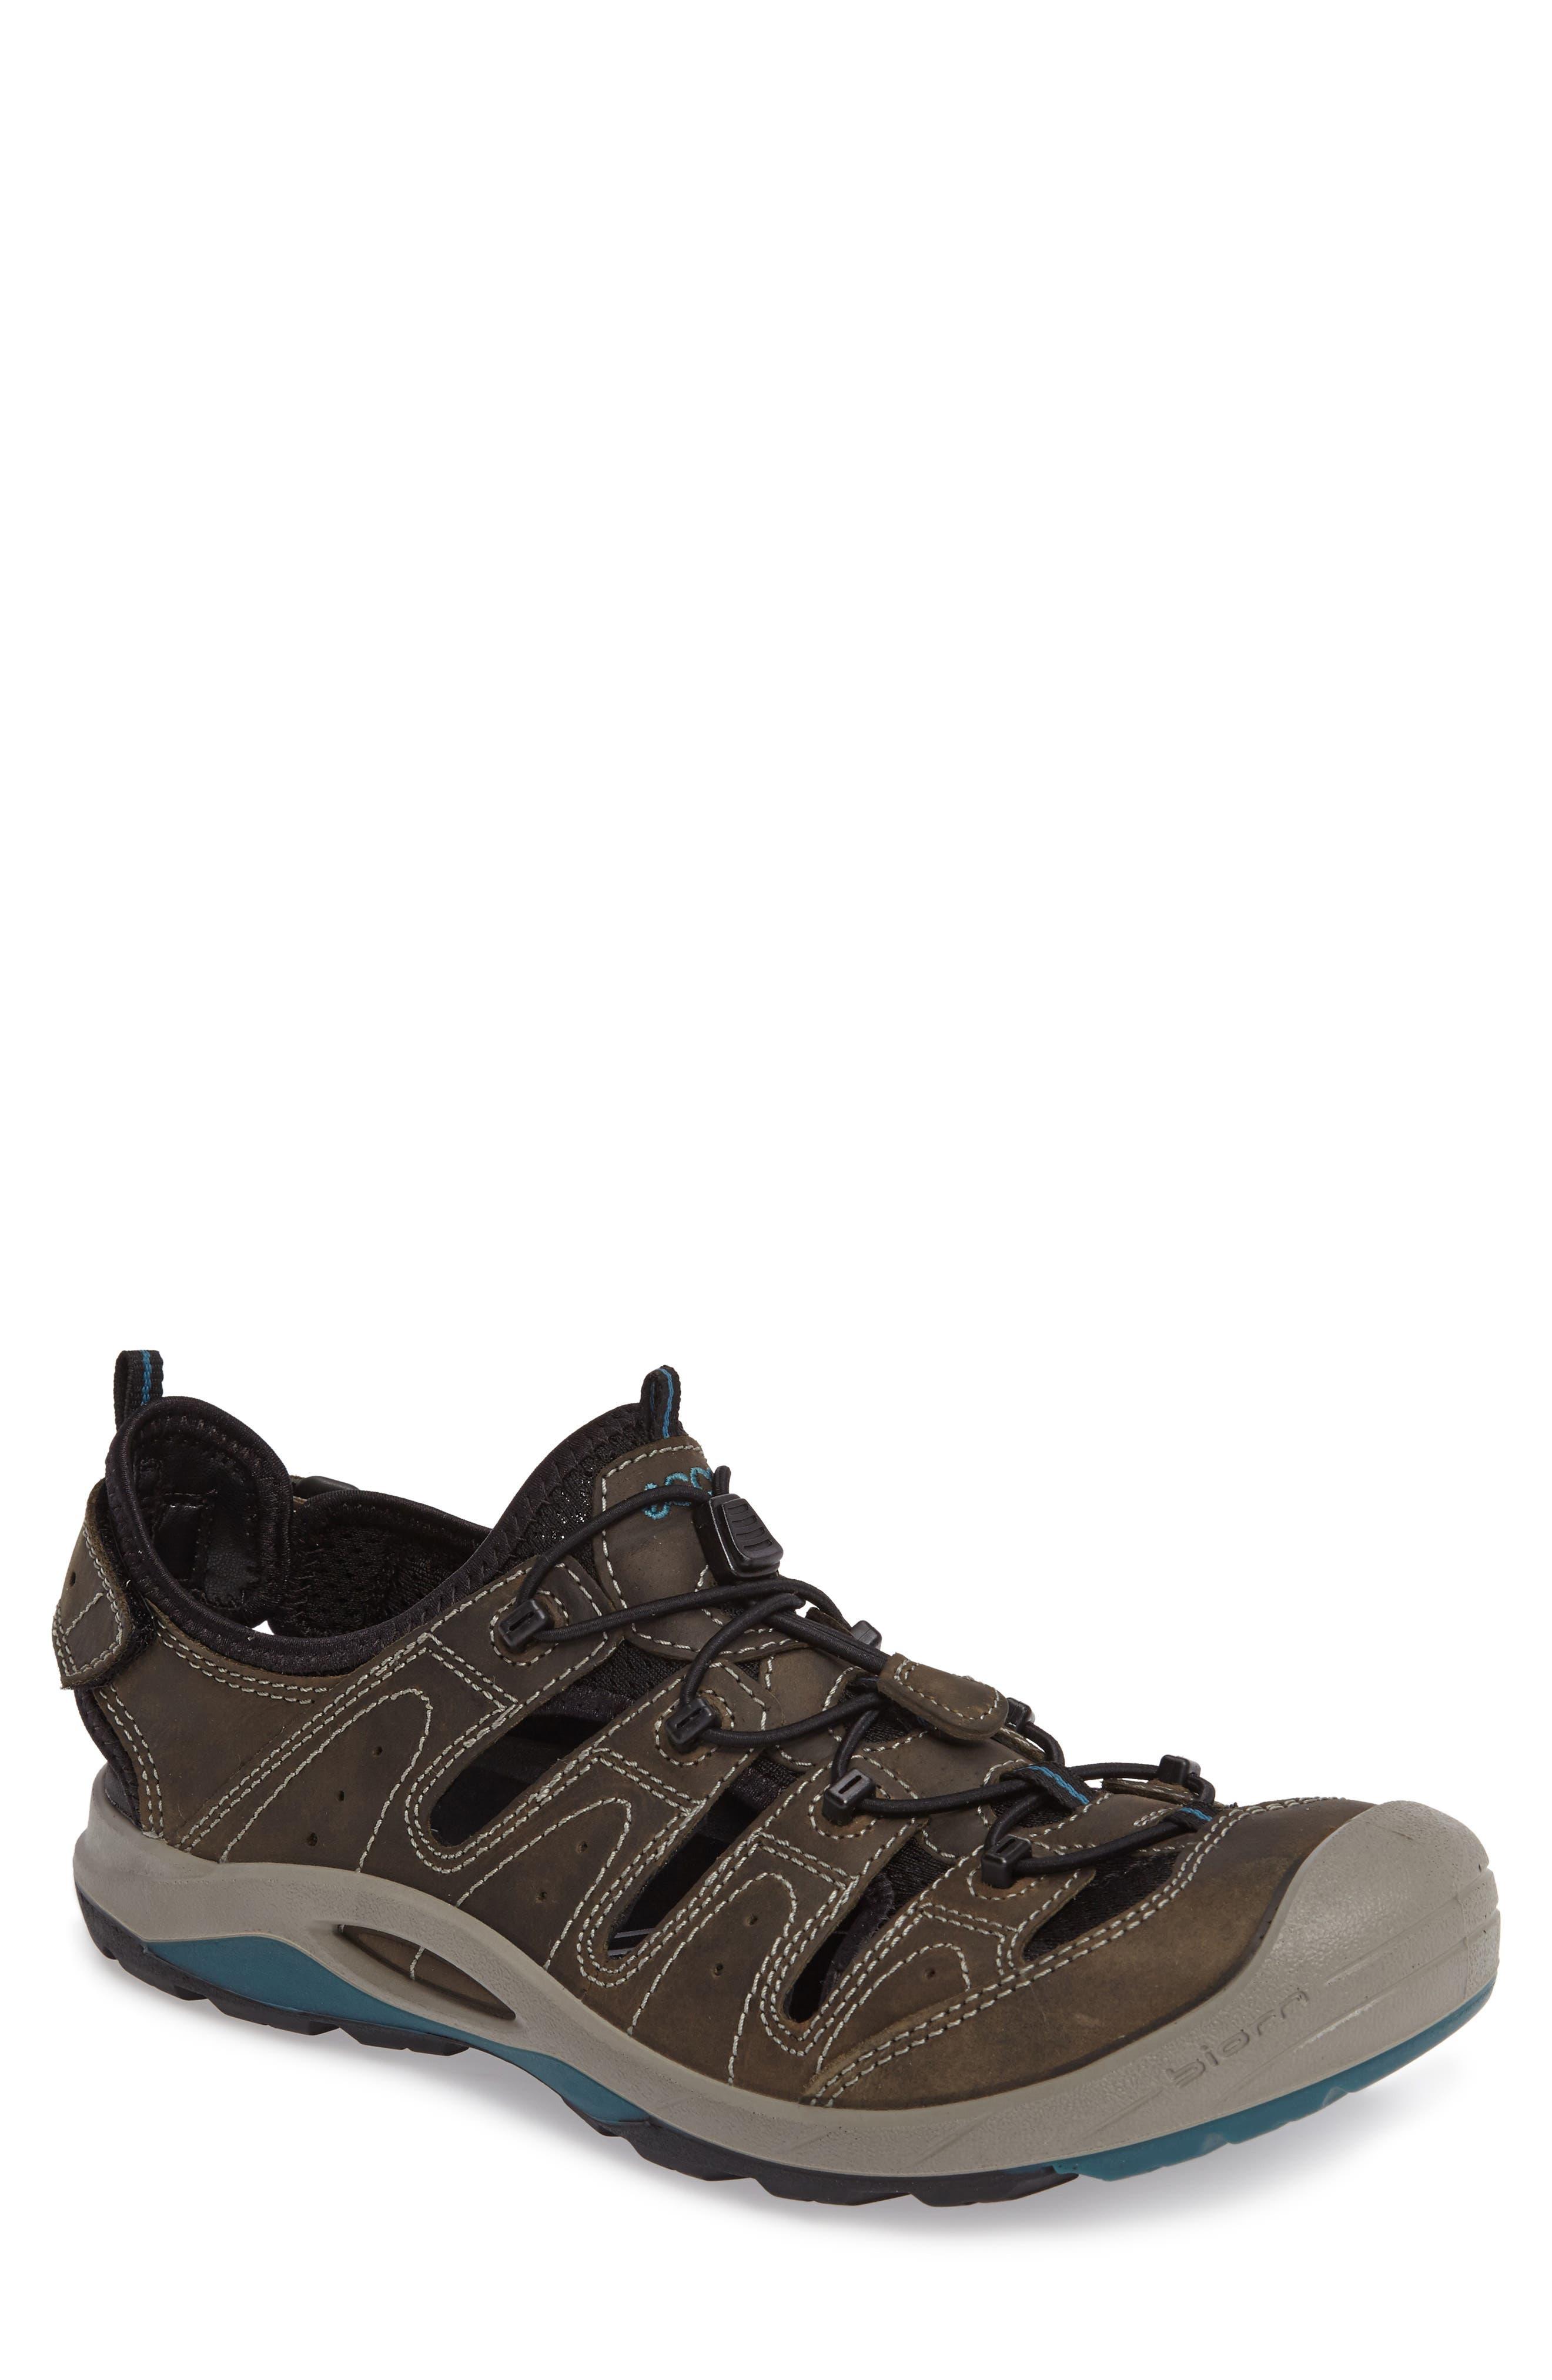 'BIOM Delta Offroad' Sandal,                             Main thumbnail 1, color,                             Tarmac/ Black